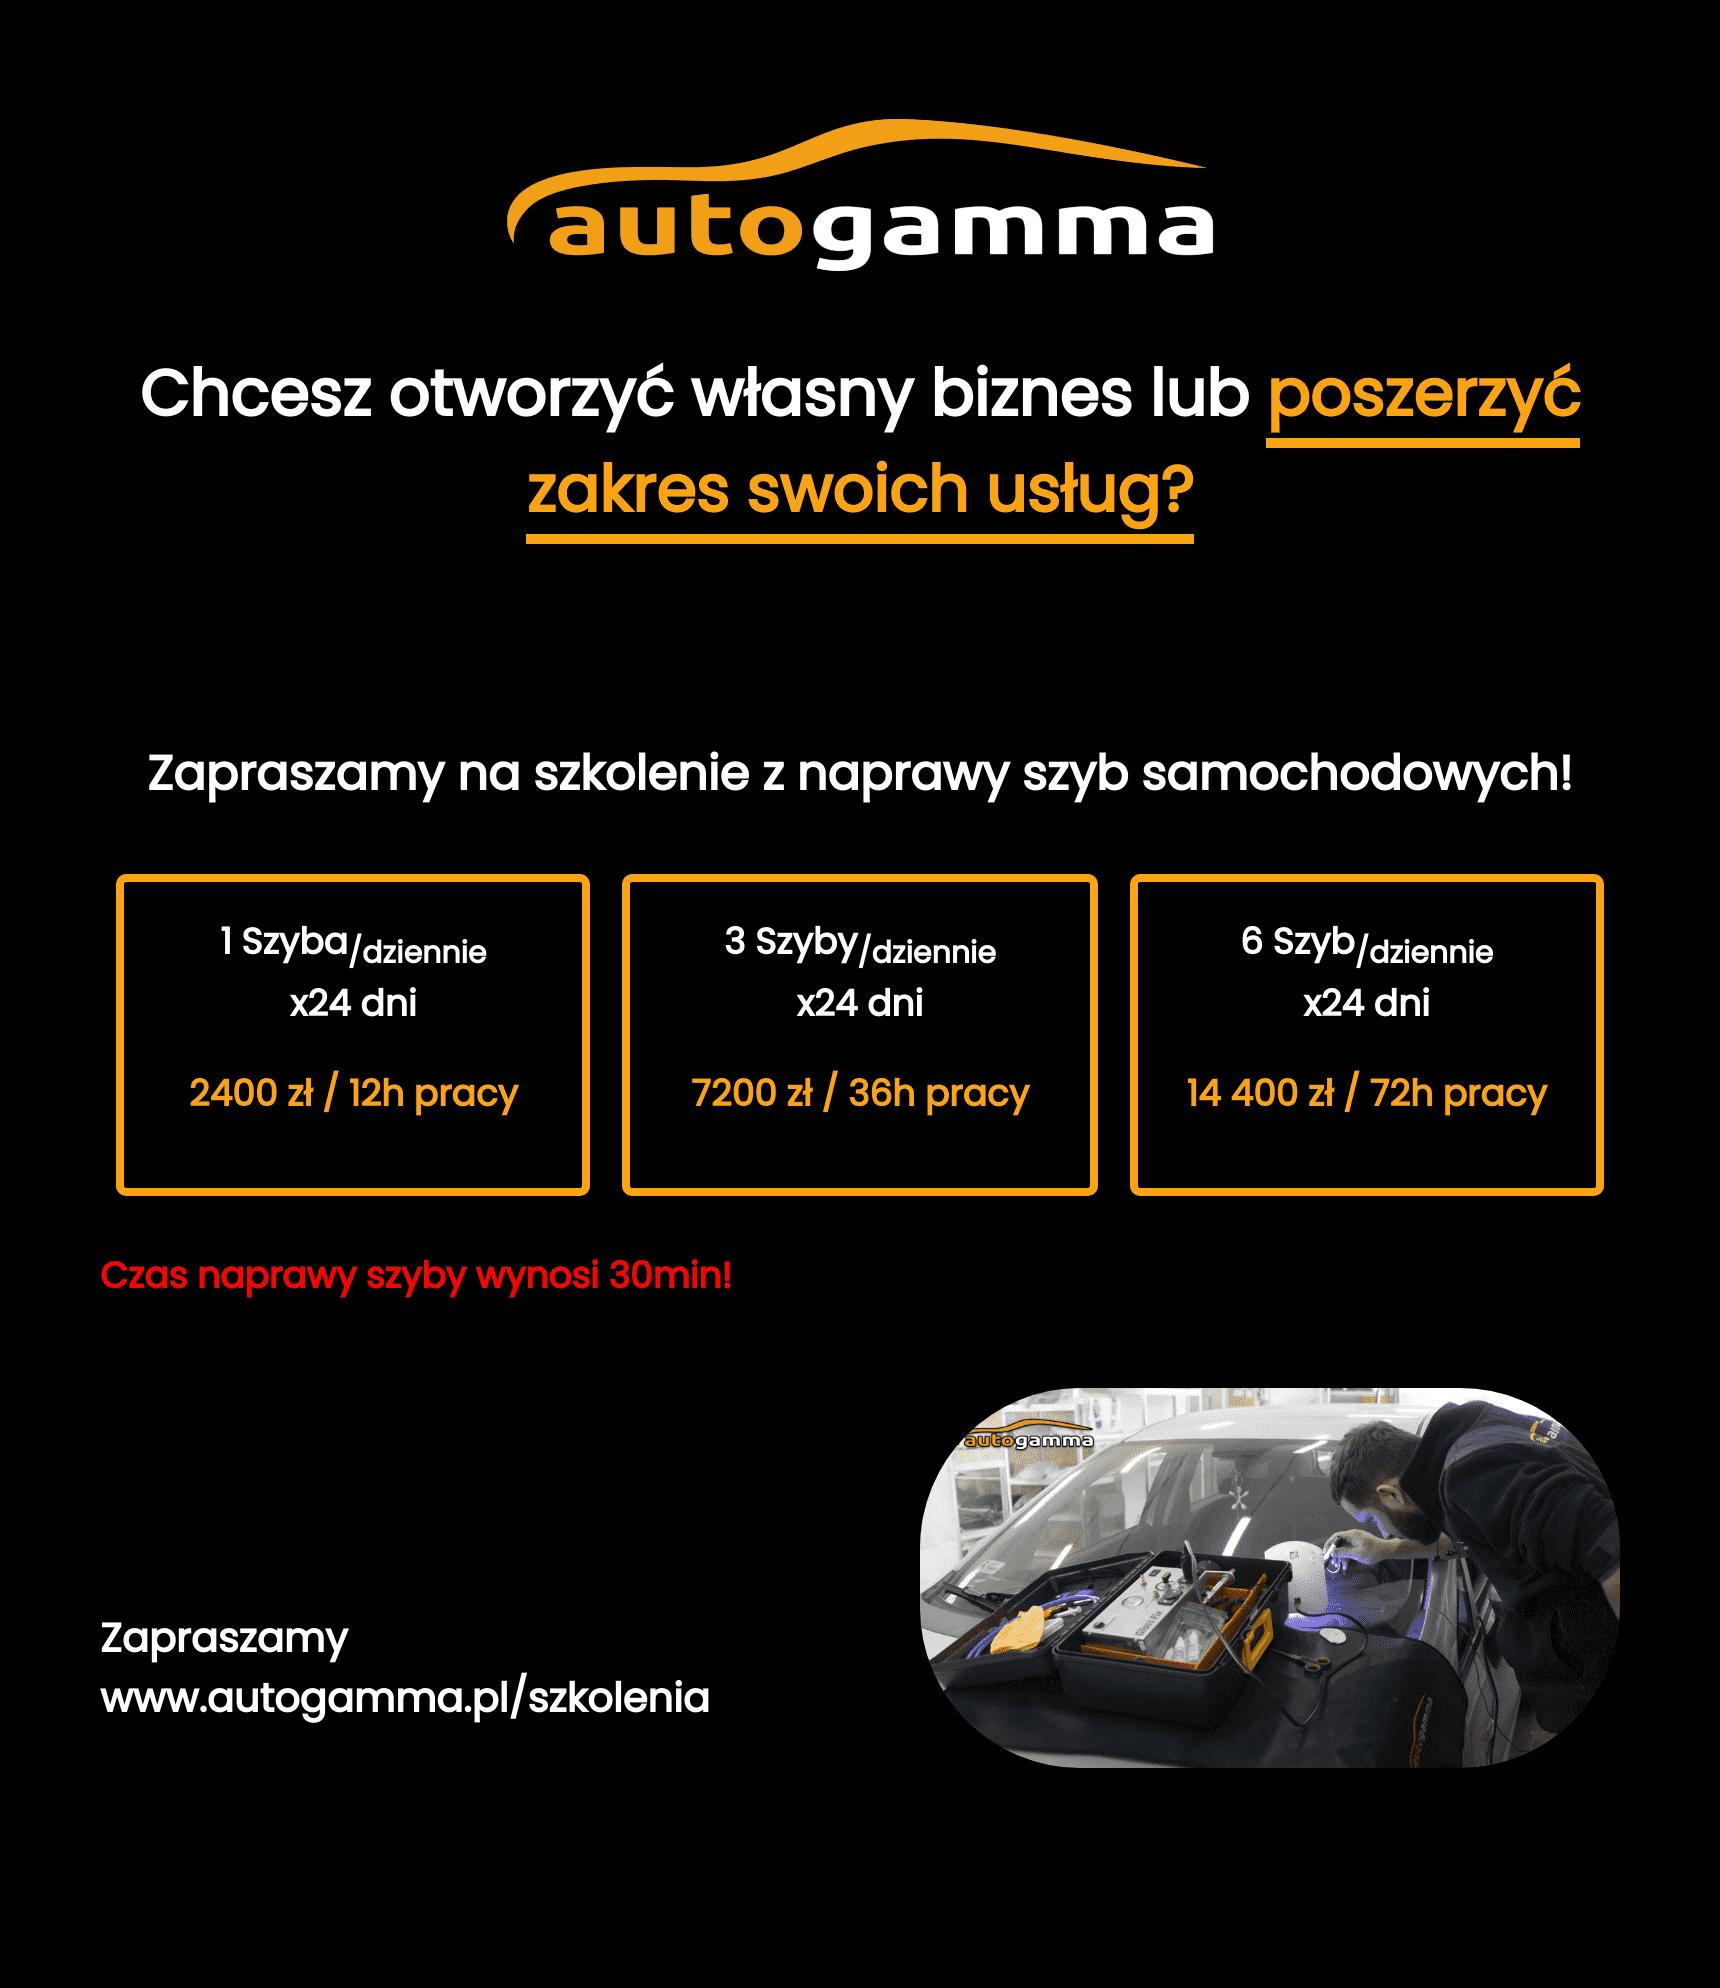 Szkolenia Auto Gamma ulotka